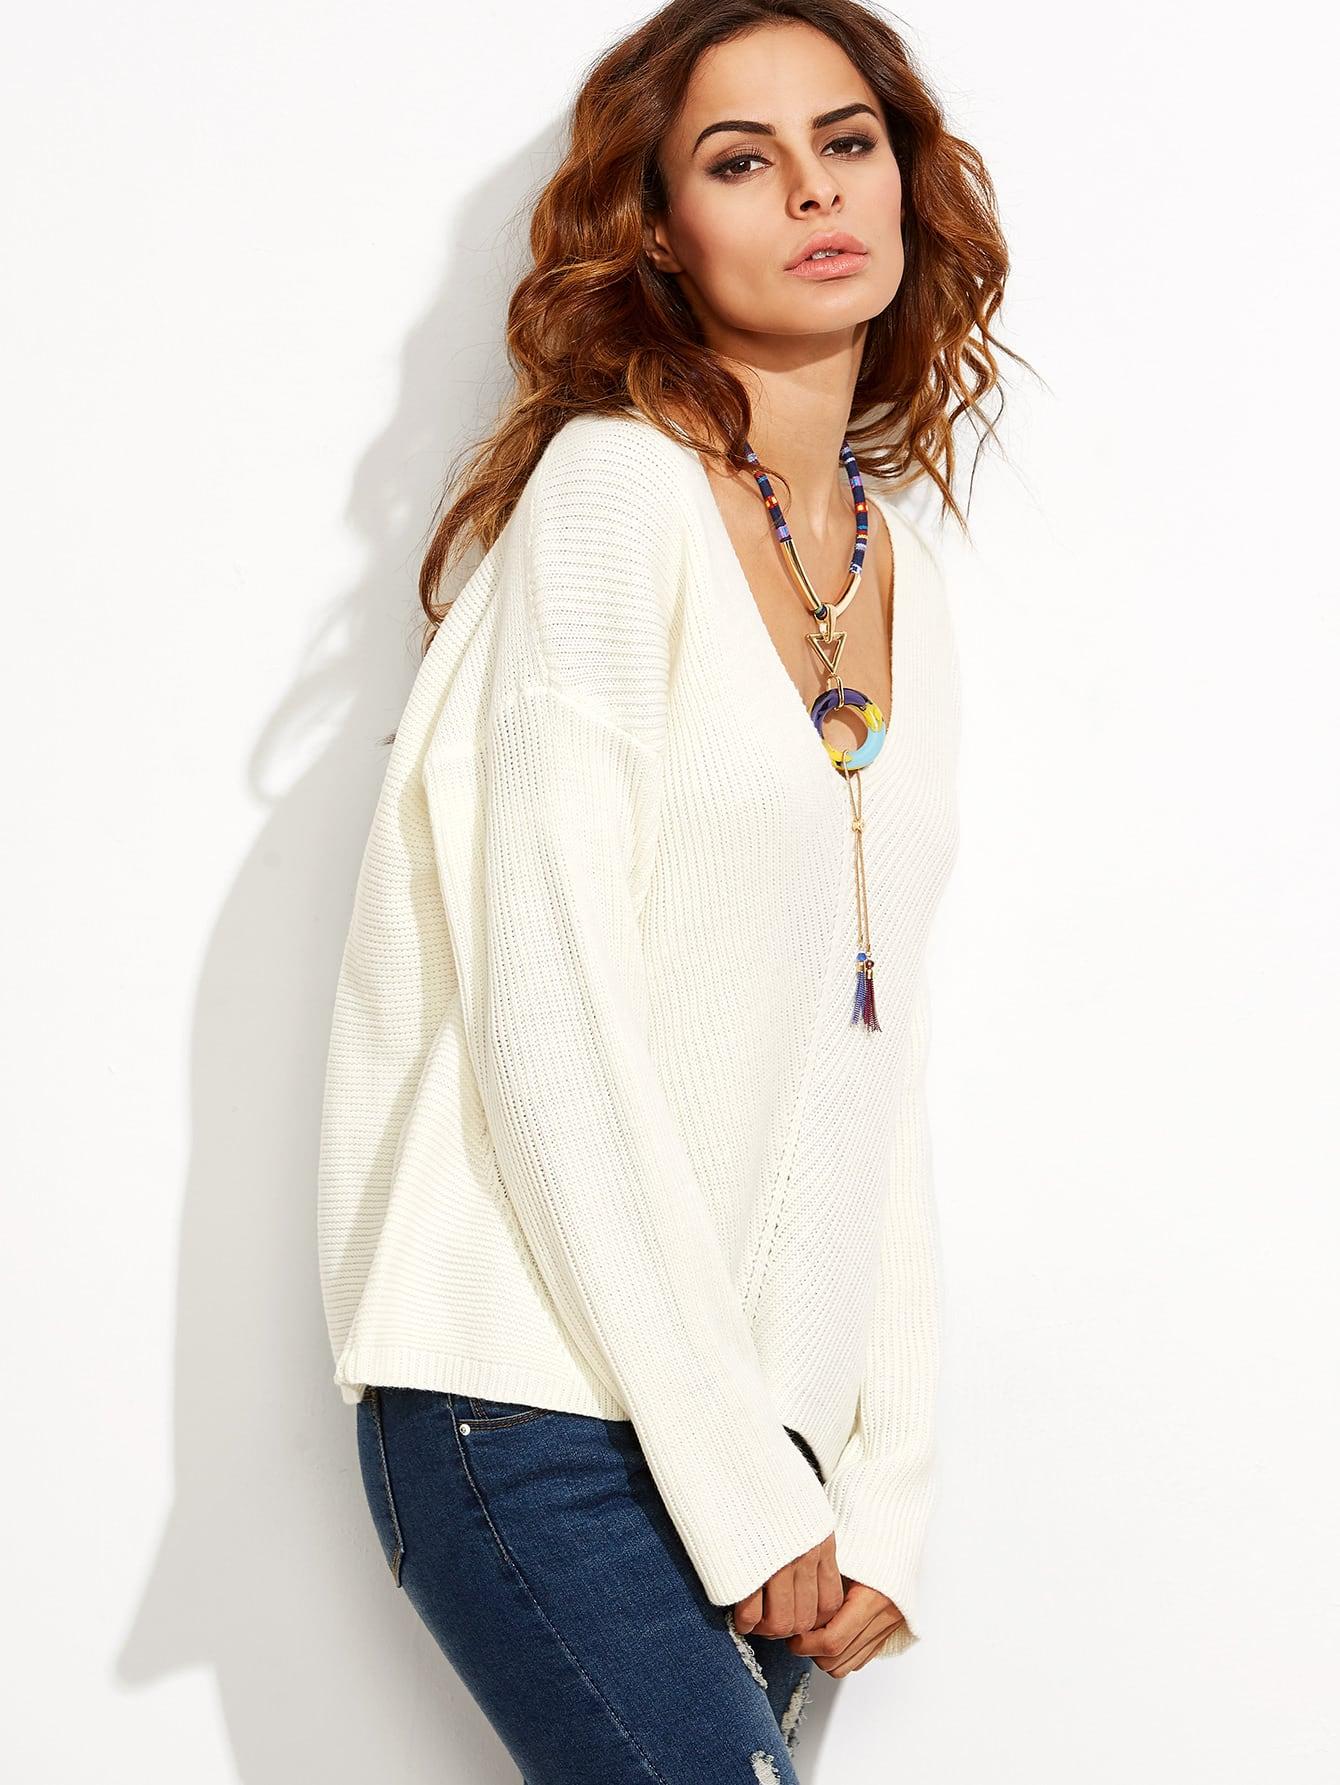 sweater160810702_2